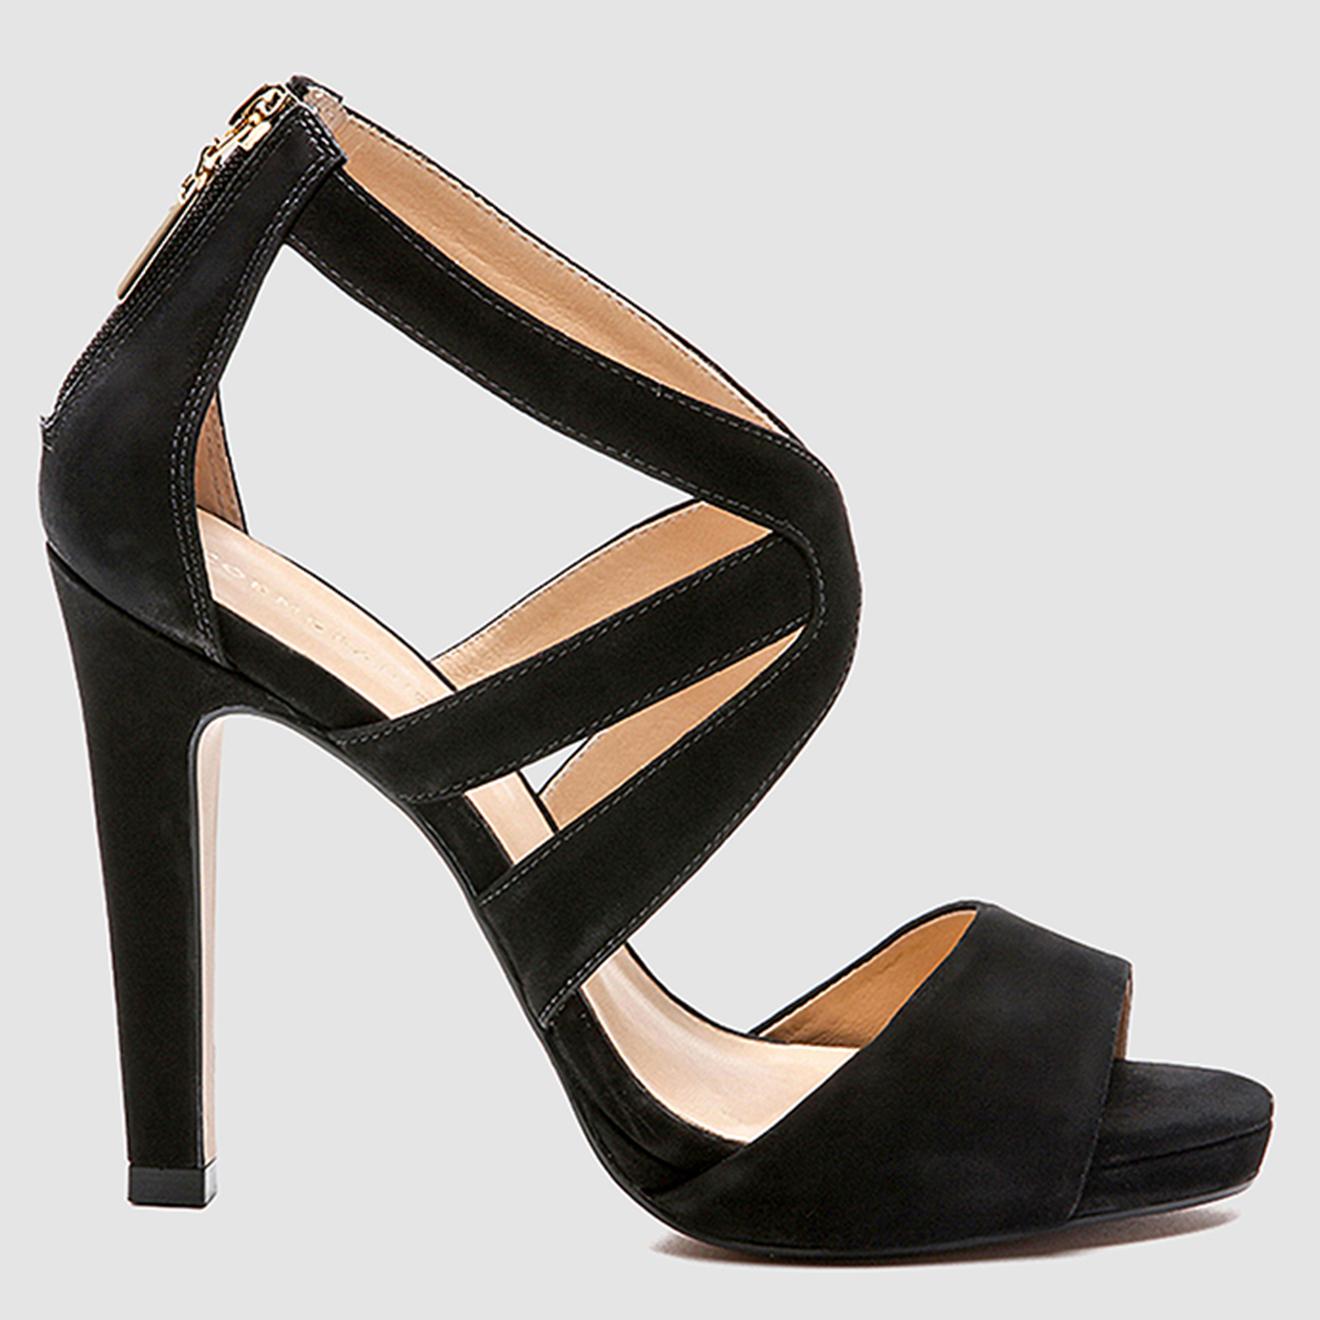 Sandales en Velours de Cuir Laelia - Talon 11 cm - Cosmoparis - Modalova